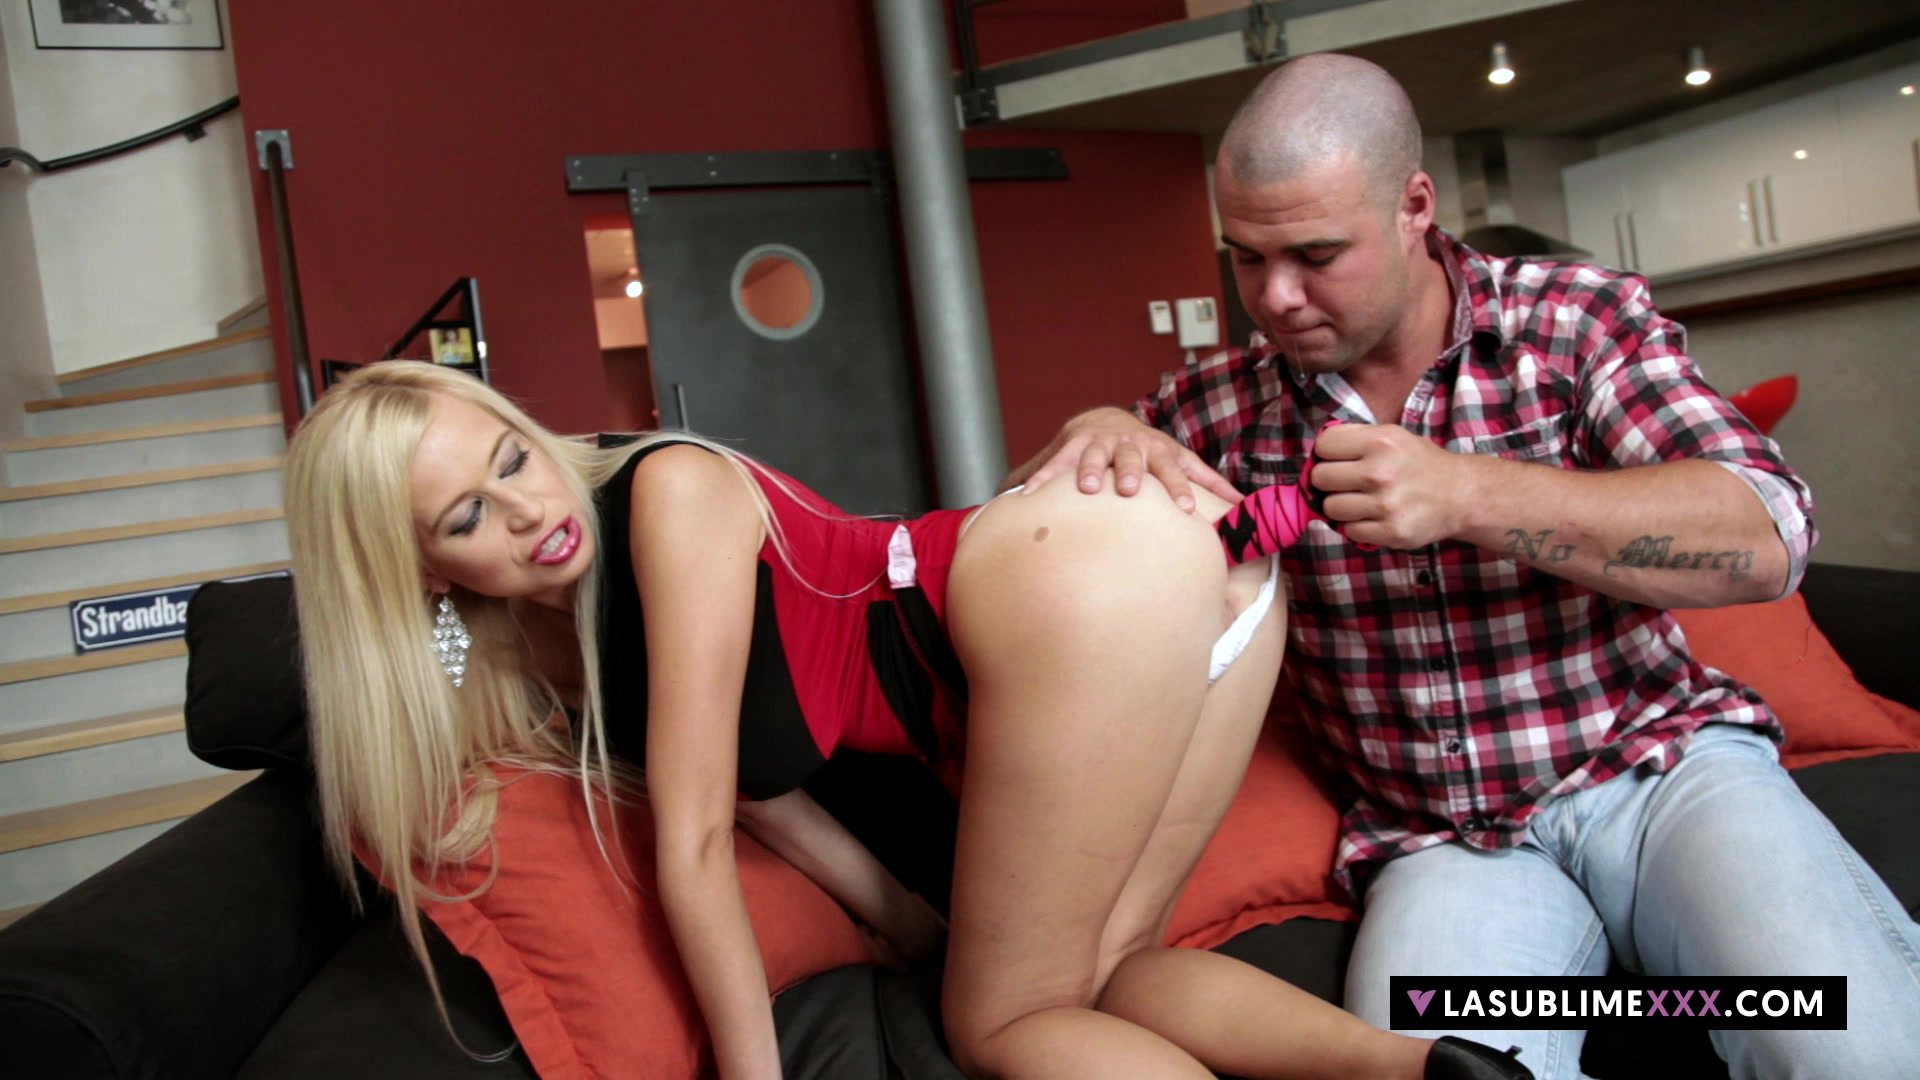 Lasublimexxx Anastasia Devine Will Get Massive Stiffy In Her Booty